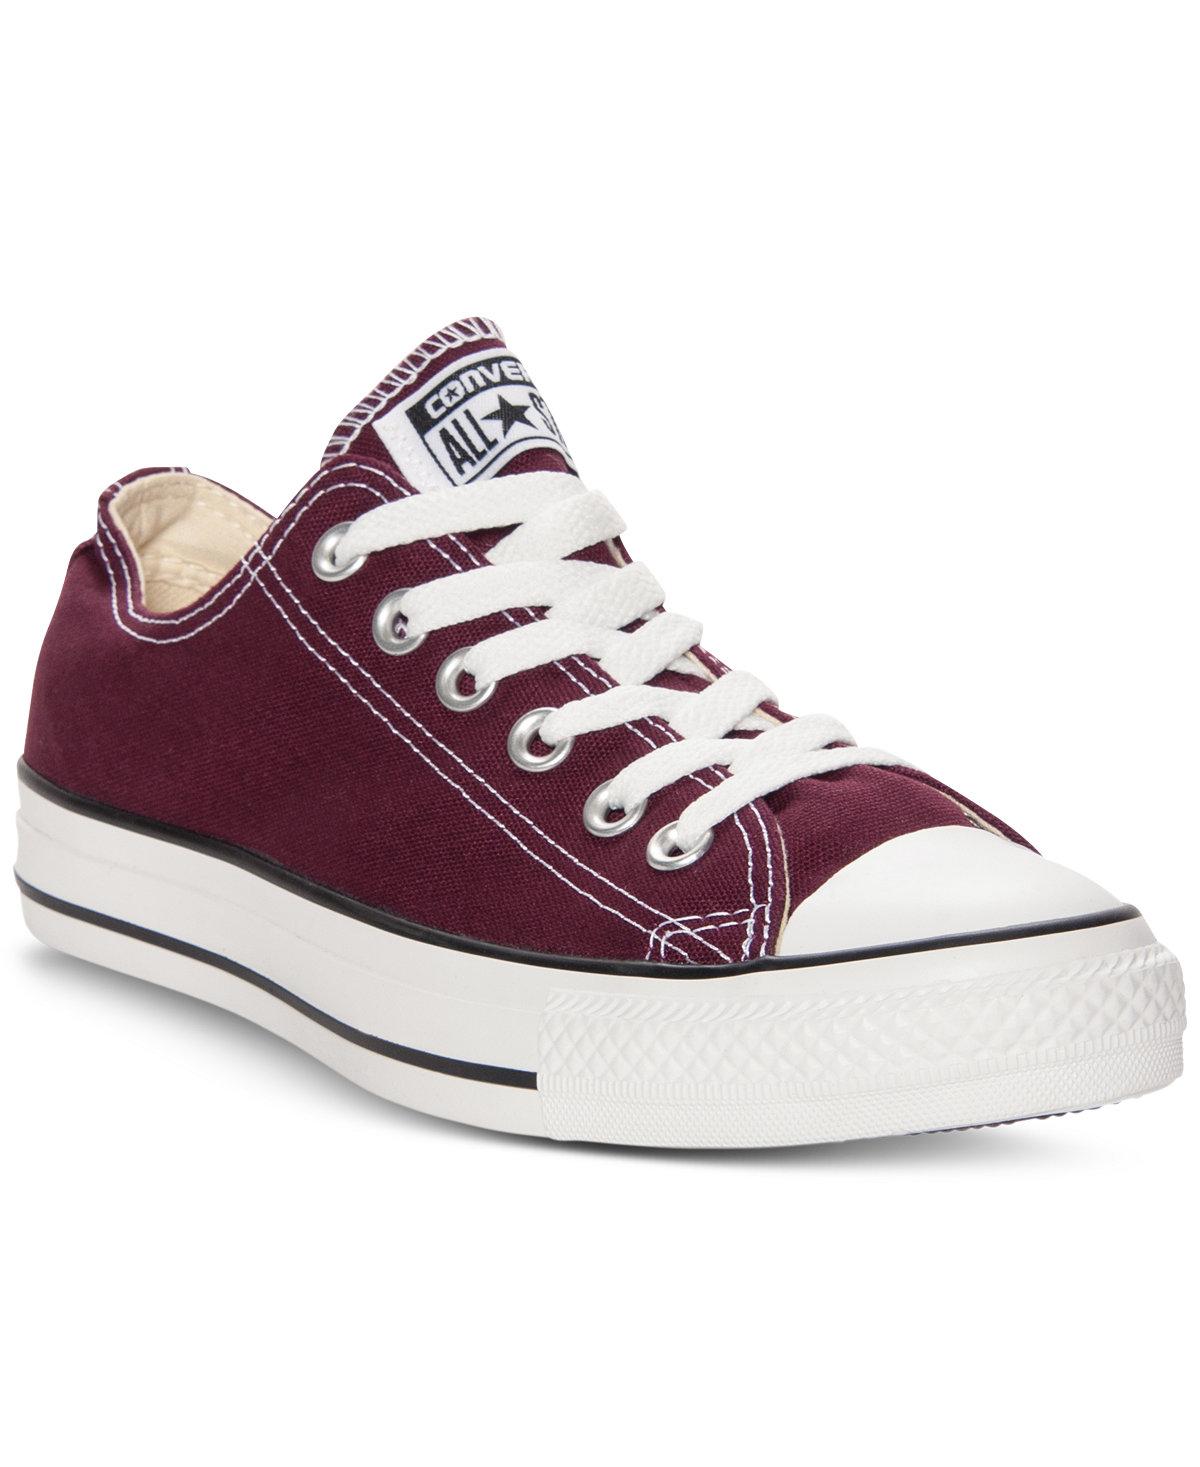 Converse Men's Chuck Taylor Ox Casual Sneakers - $39.98